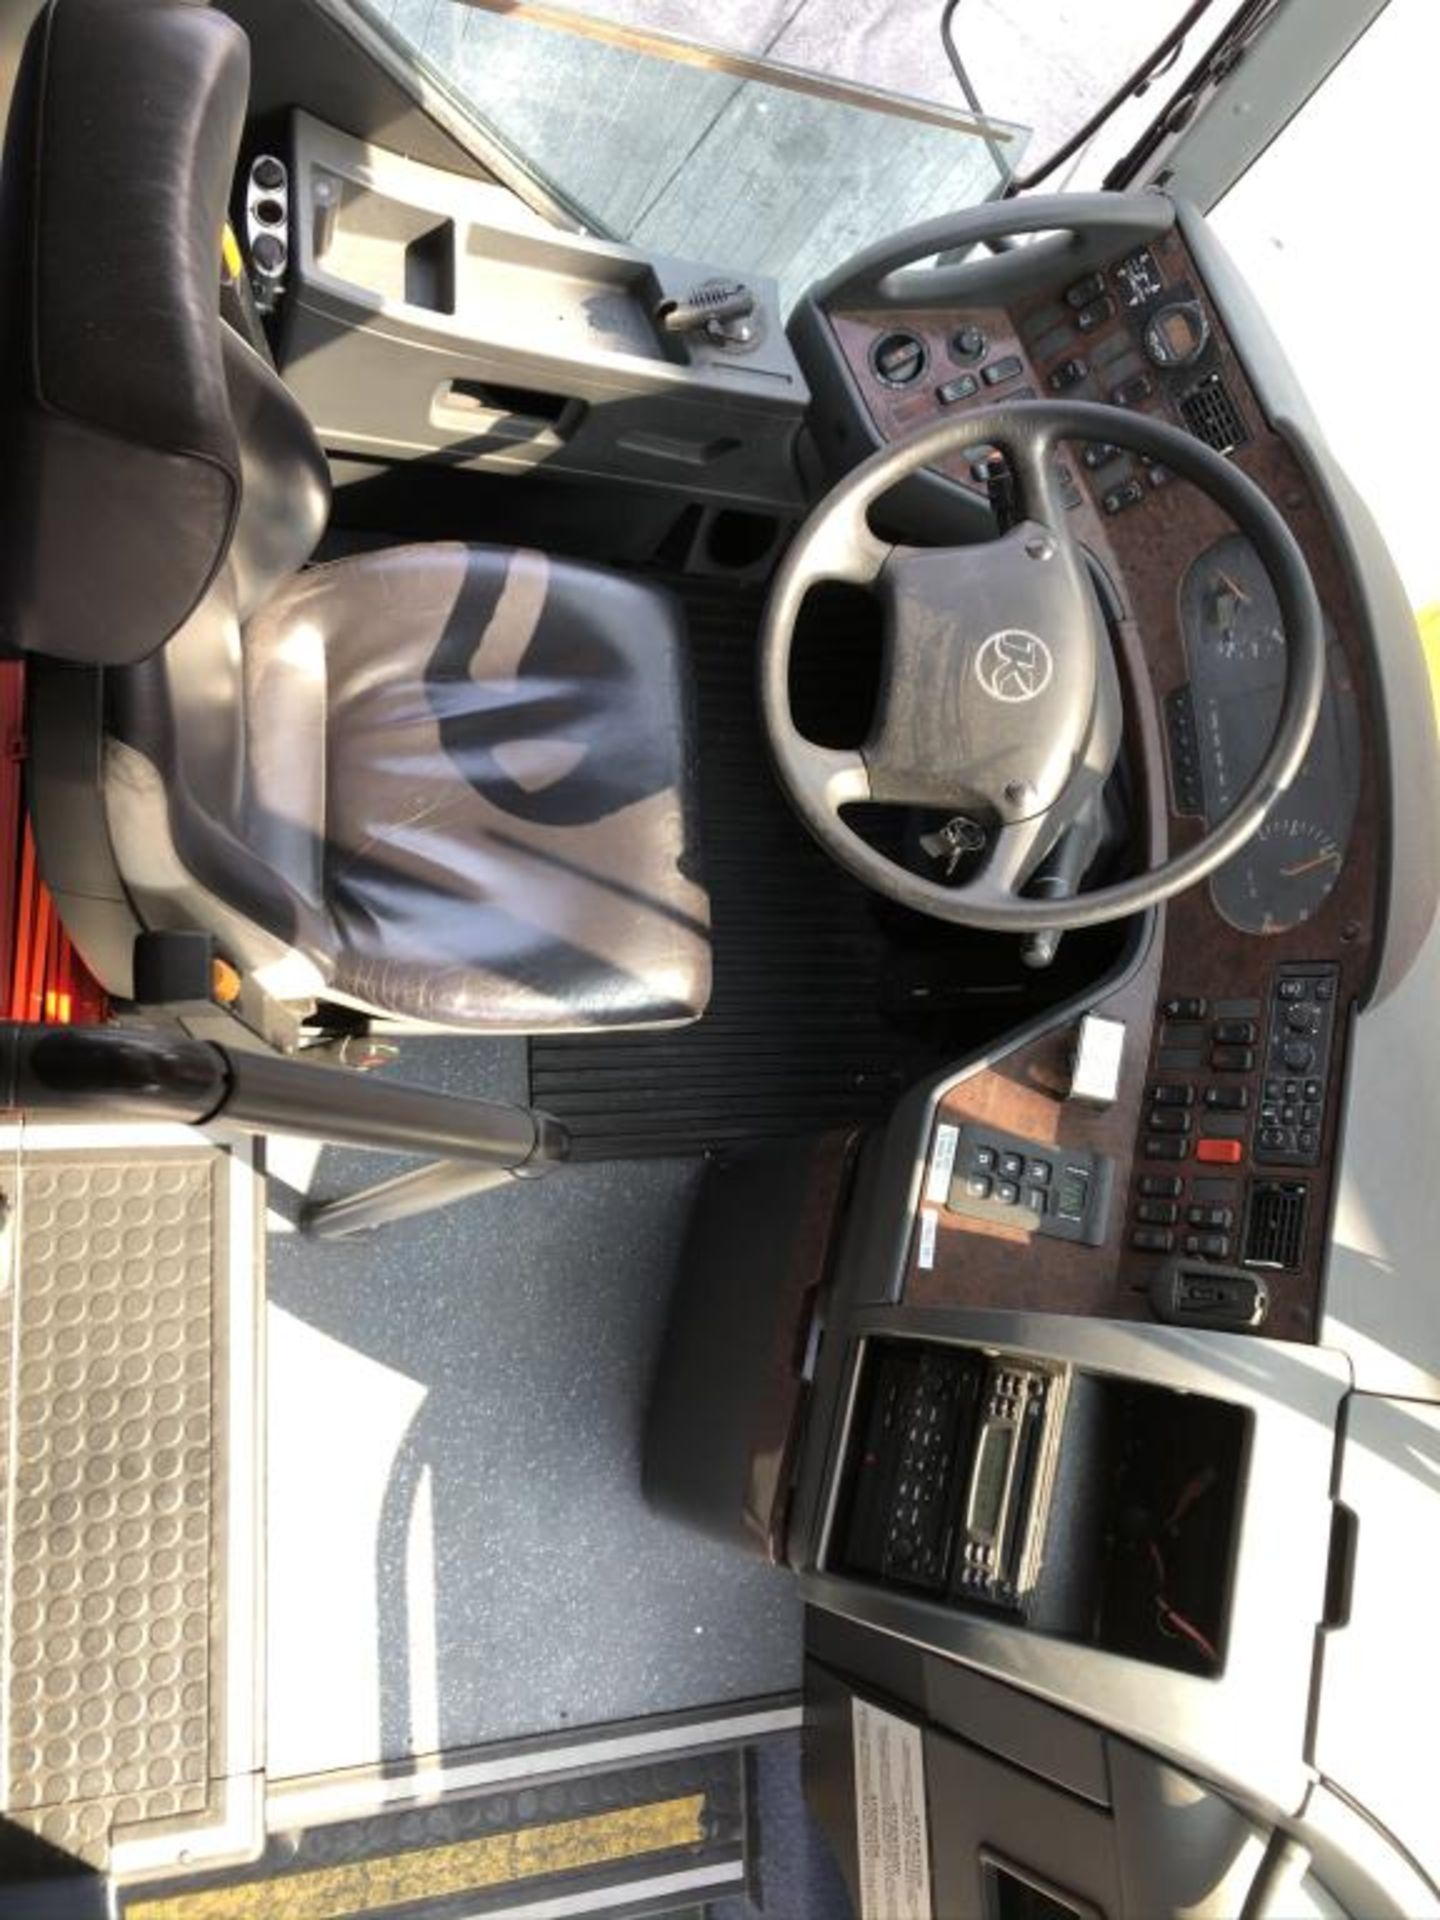 Motor Coach - Image 12 of 19